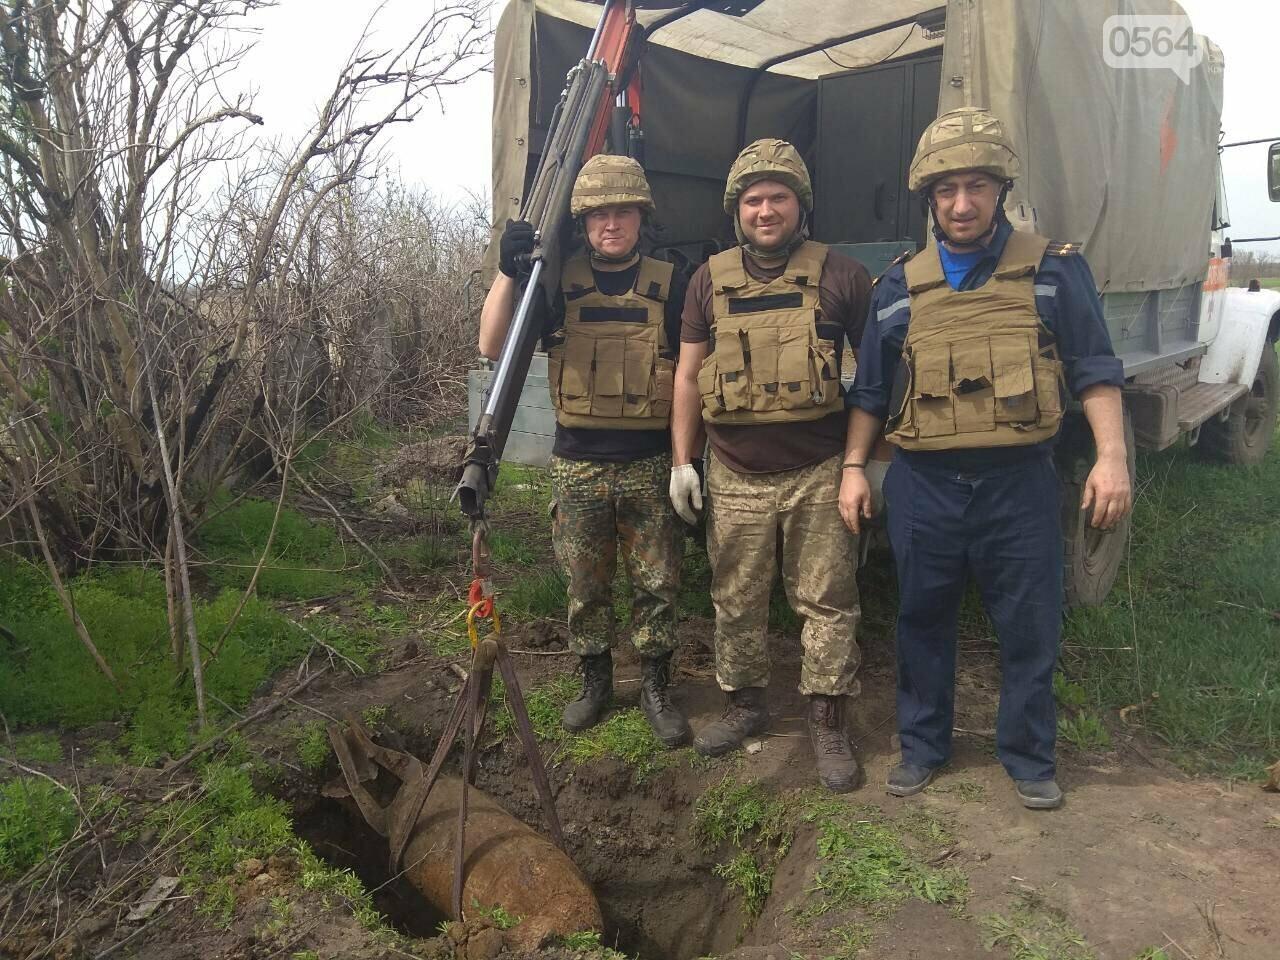 На Днепропетровщине взорвали фугасную авиационную бомбу (ФОТО, ВИДЕО), фото-3